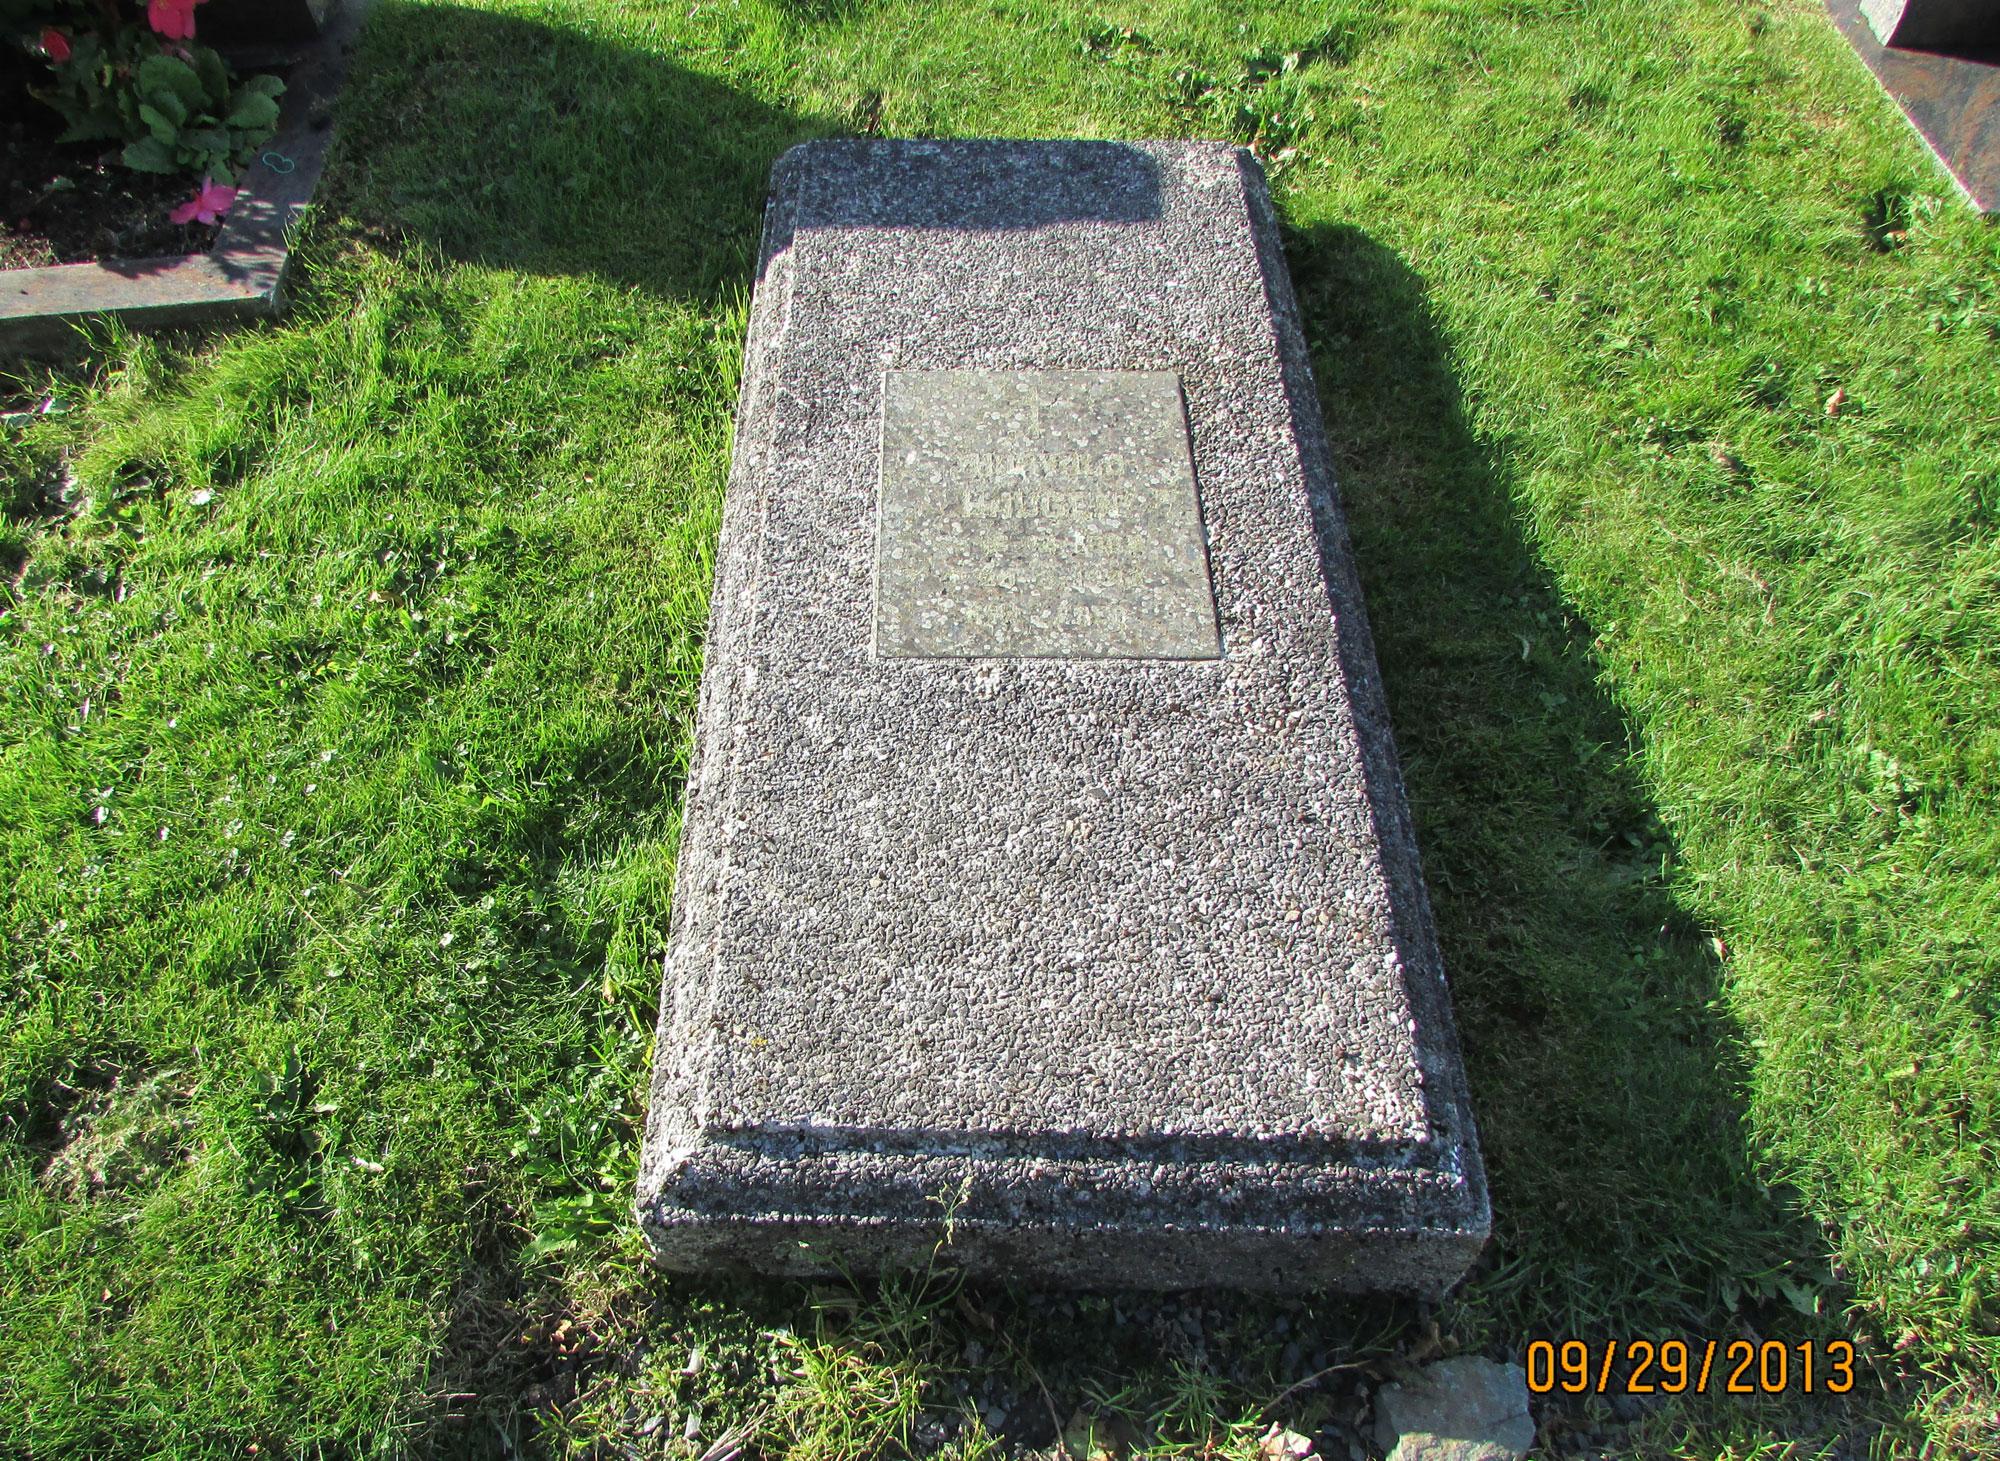 Avaldsnes Cemetery, Karmøy, Norway - Sq. D, Row 3, Grave 15 (photo courtesy of Norm & Lynette Haugen)